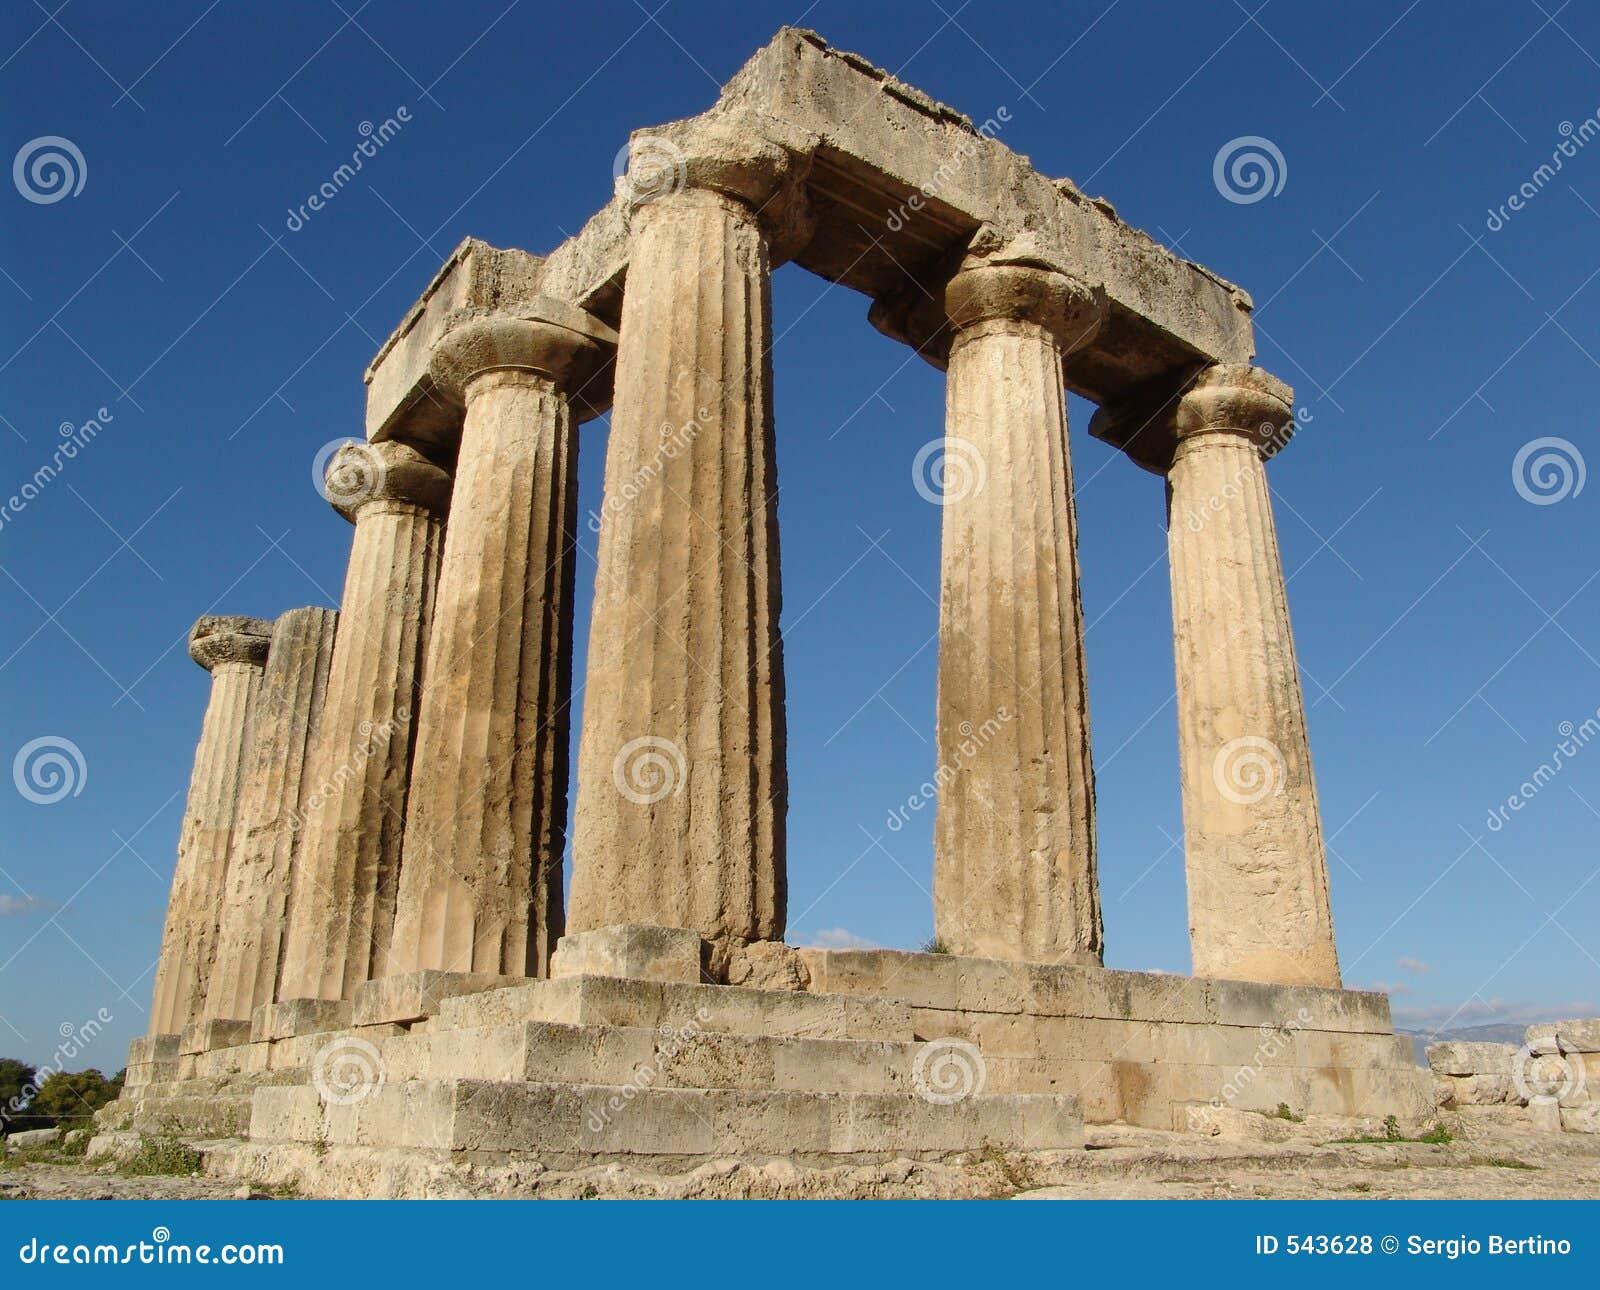 Download 希腊语废墟 库存照片. 图片 包括有 更加恼怒的, 被破坏的, 希腊语, 希腊, 石制品, 户外, 石头, 结构 - 543628